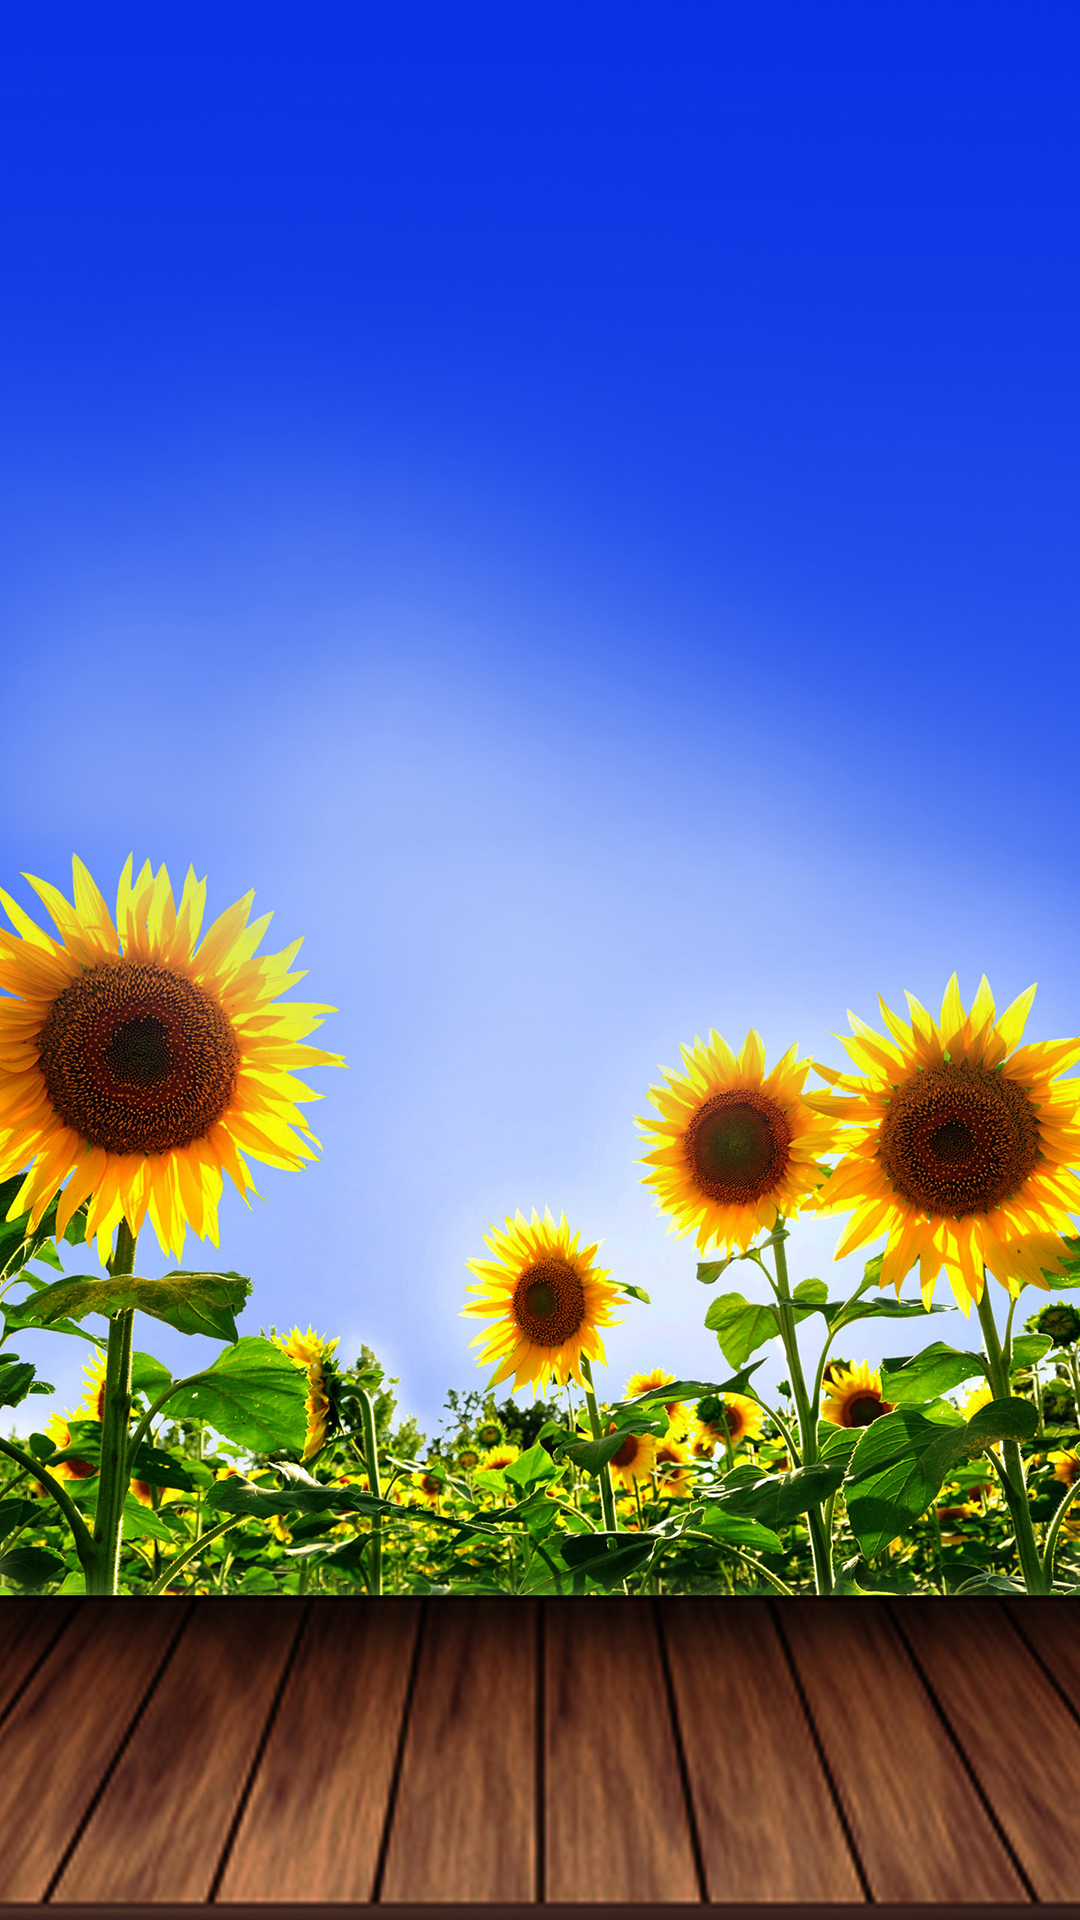 Summer Sunflower Wallpaper iPhone 6 by Mattiebonez on DeviantArt